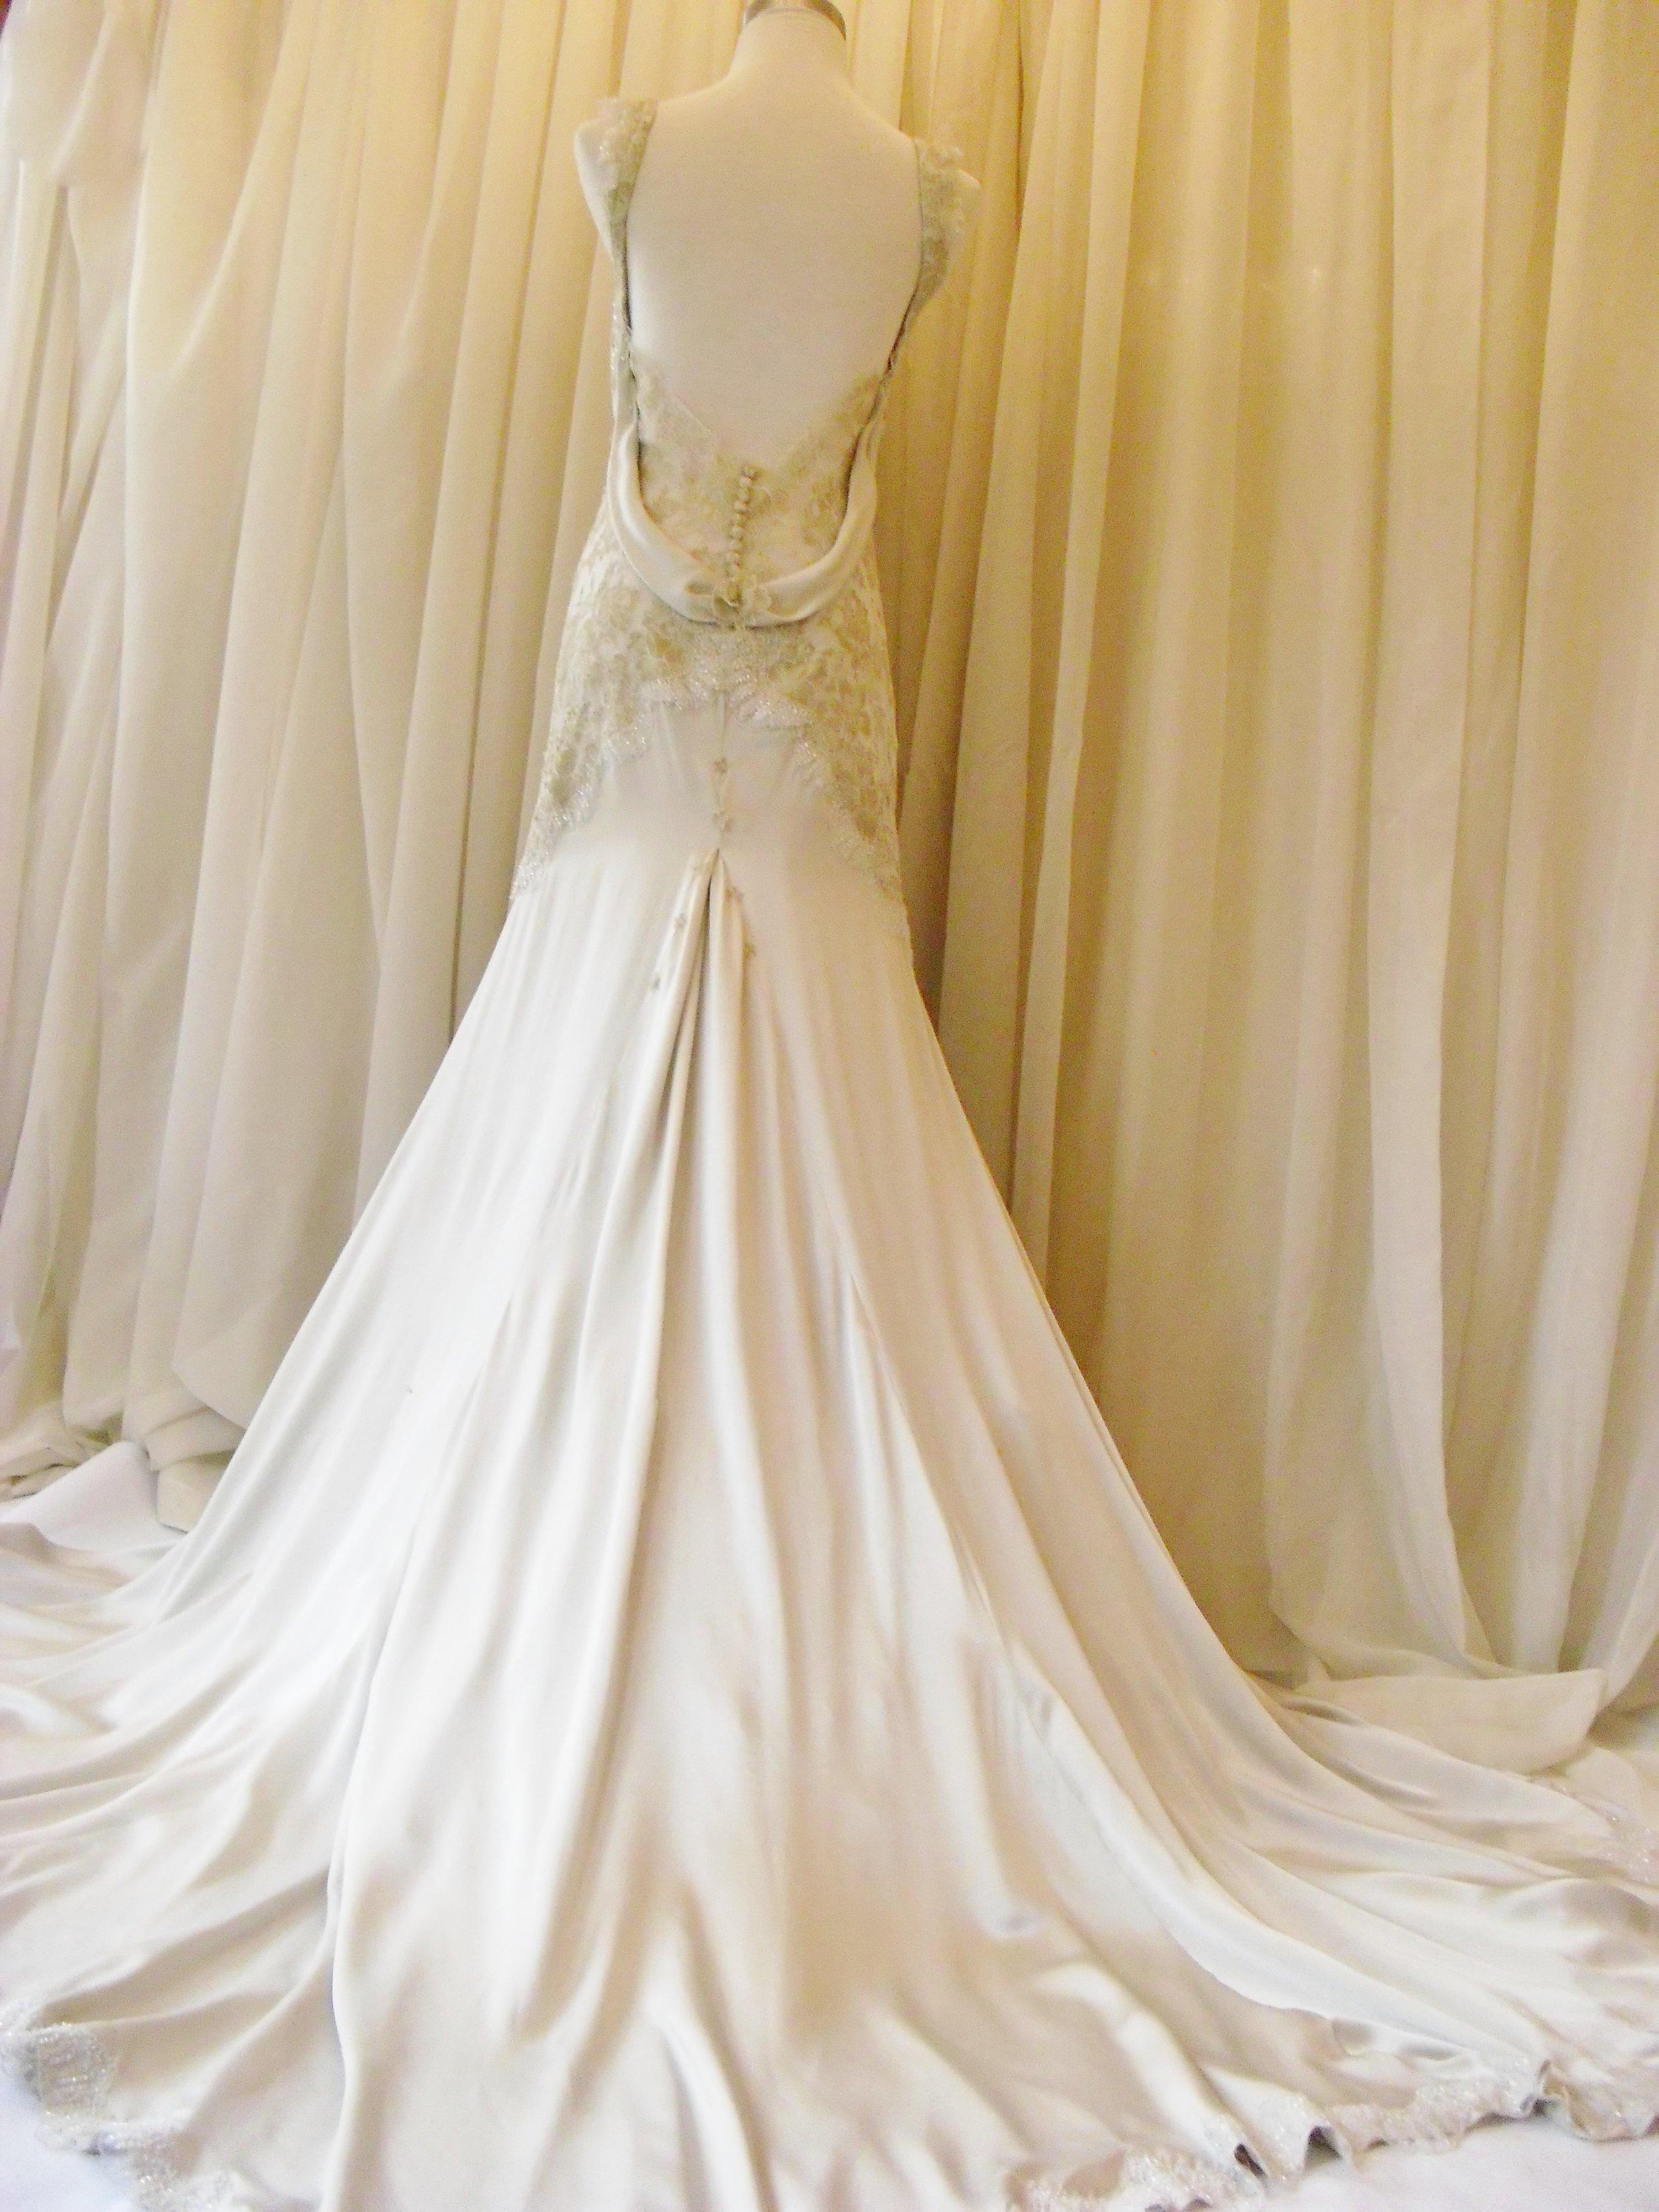 Eve - silk peau de soie, french lace - Tekapo wedding - studio shot